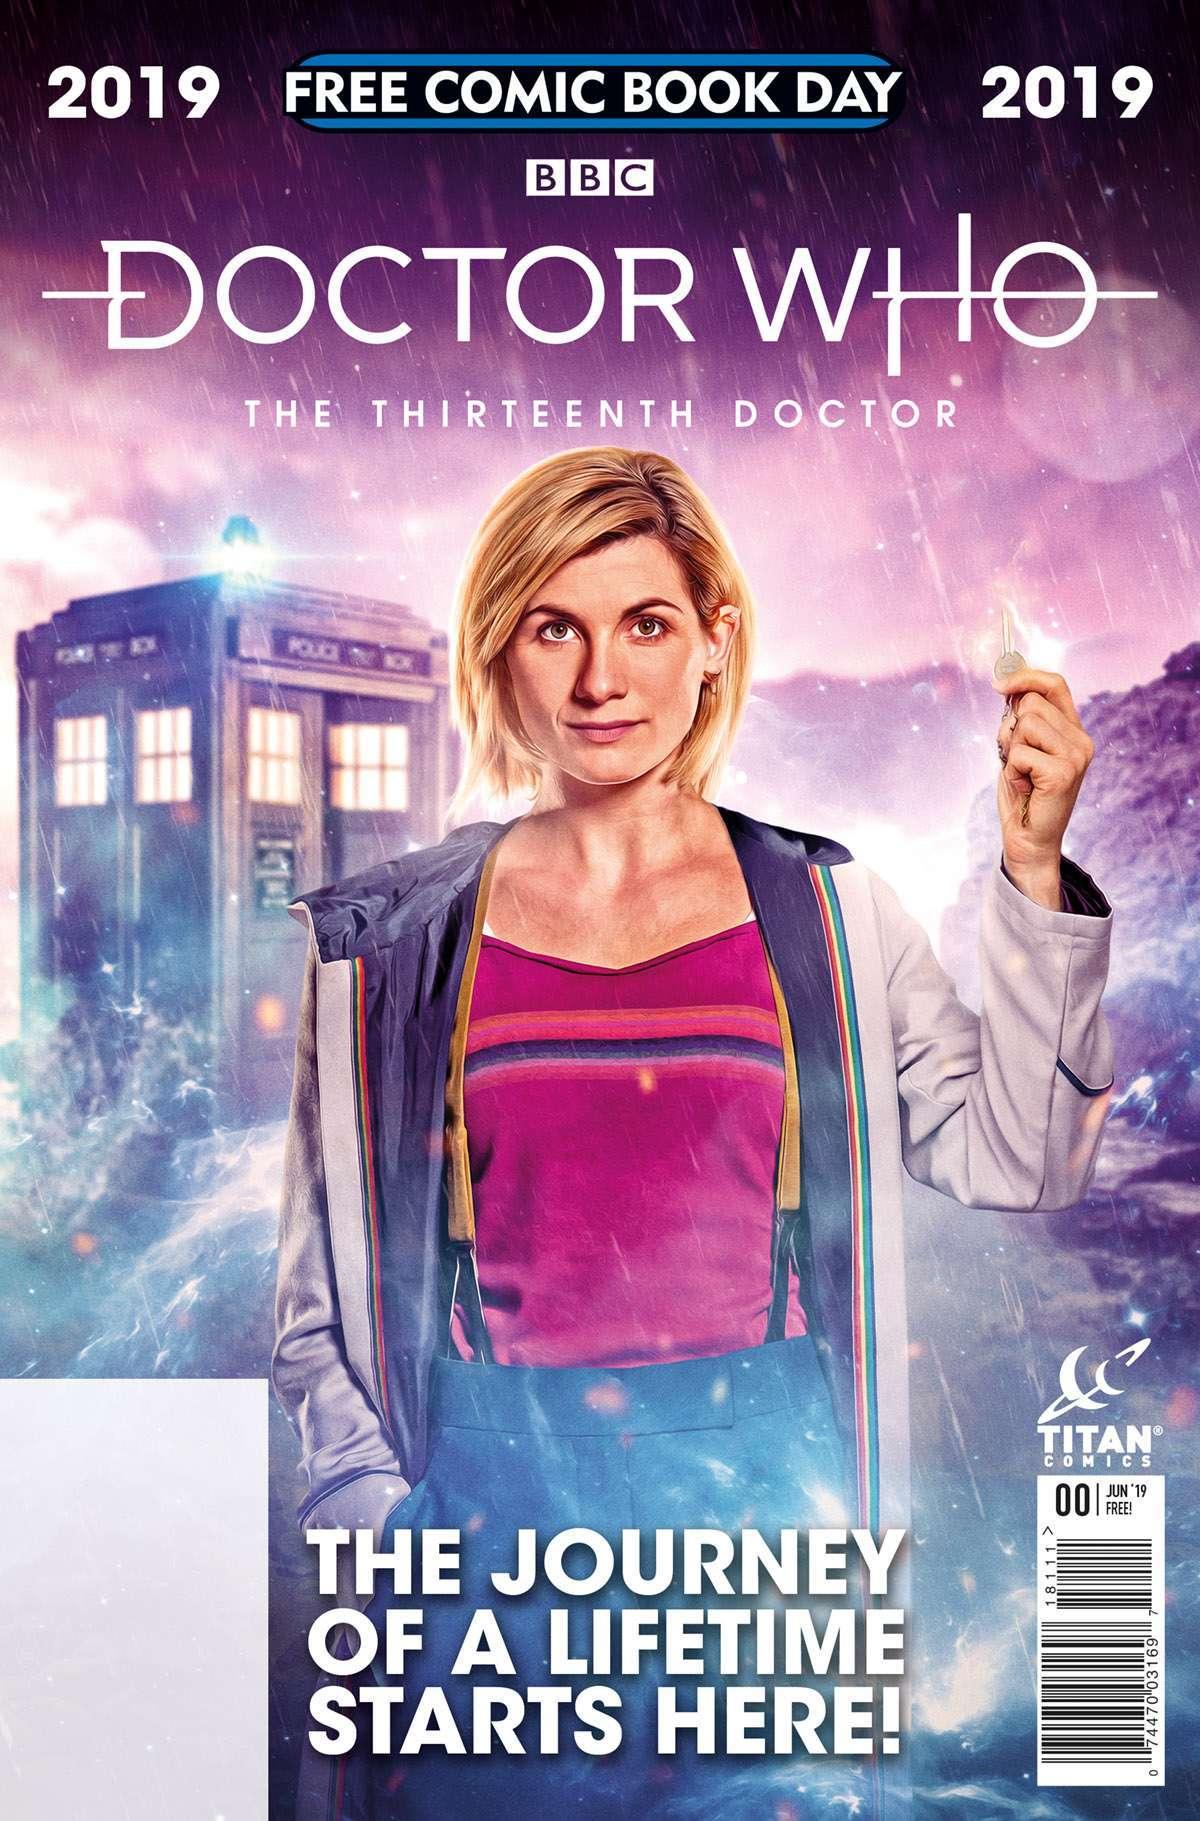 FCBD19_G_Titan Comics_Doctor Who 13th Doctor